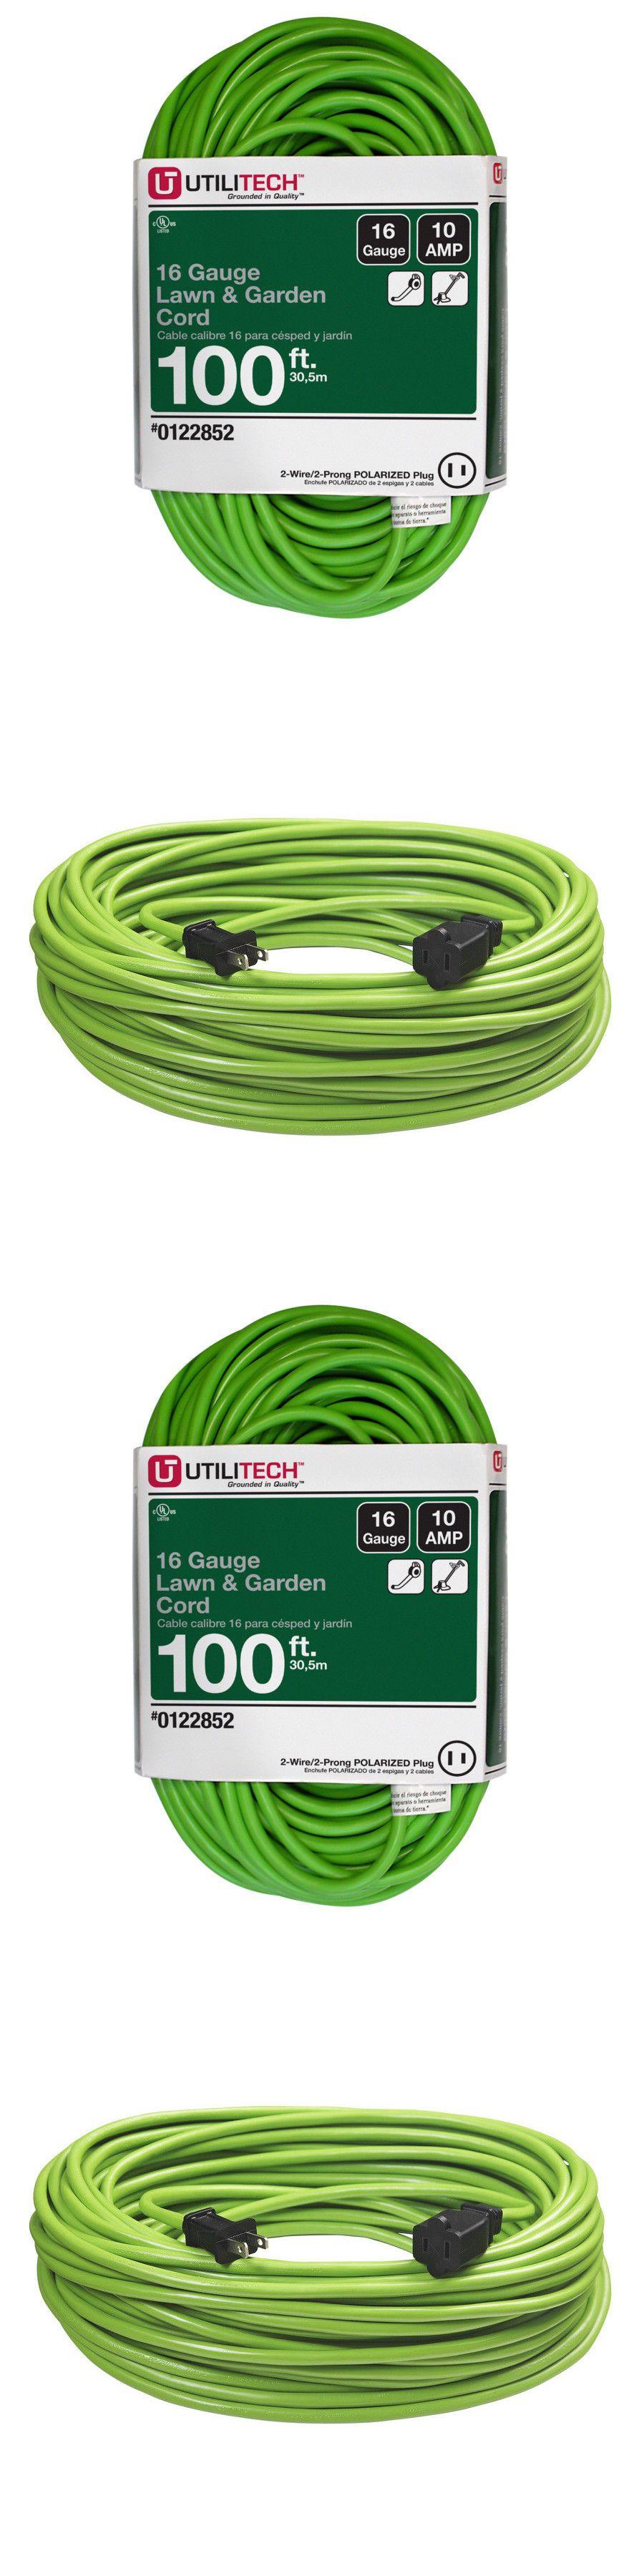 Utilitech 100 Ft 10 Amp 125 V 16 Gauge Lime Green Outdoor Garden Extension Cord 761768398906 Ebay Extension Cord Outdoor Garden Cord